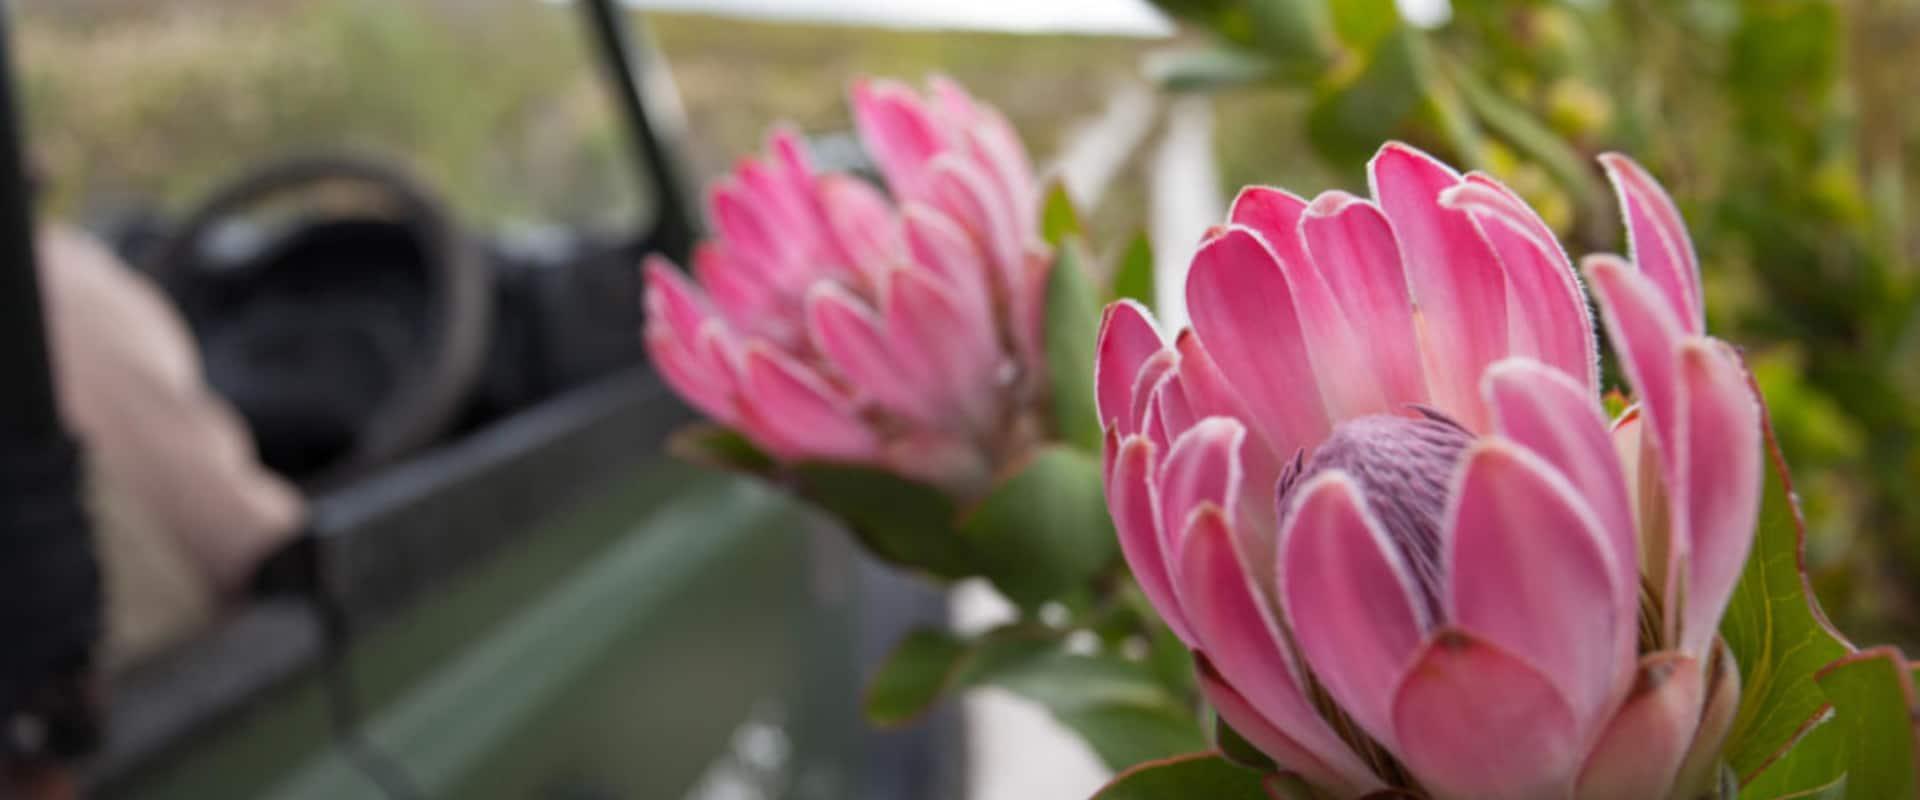 Enjoy a 4×4 flower safari on the reserve